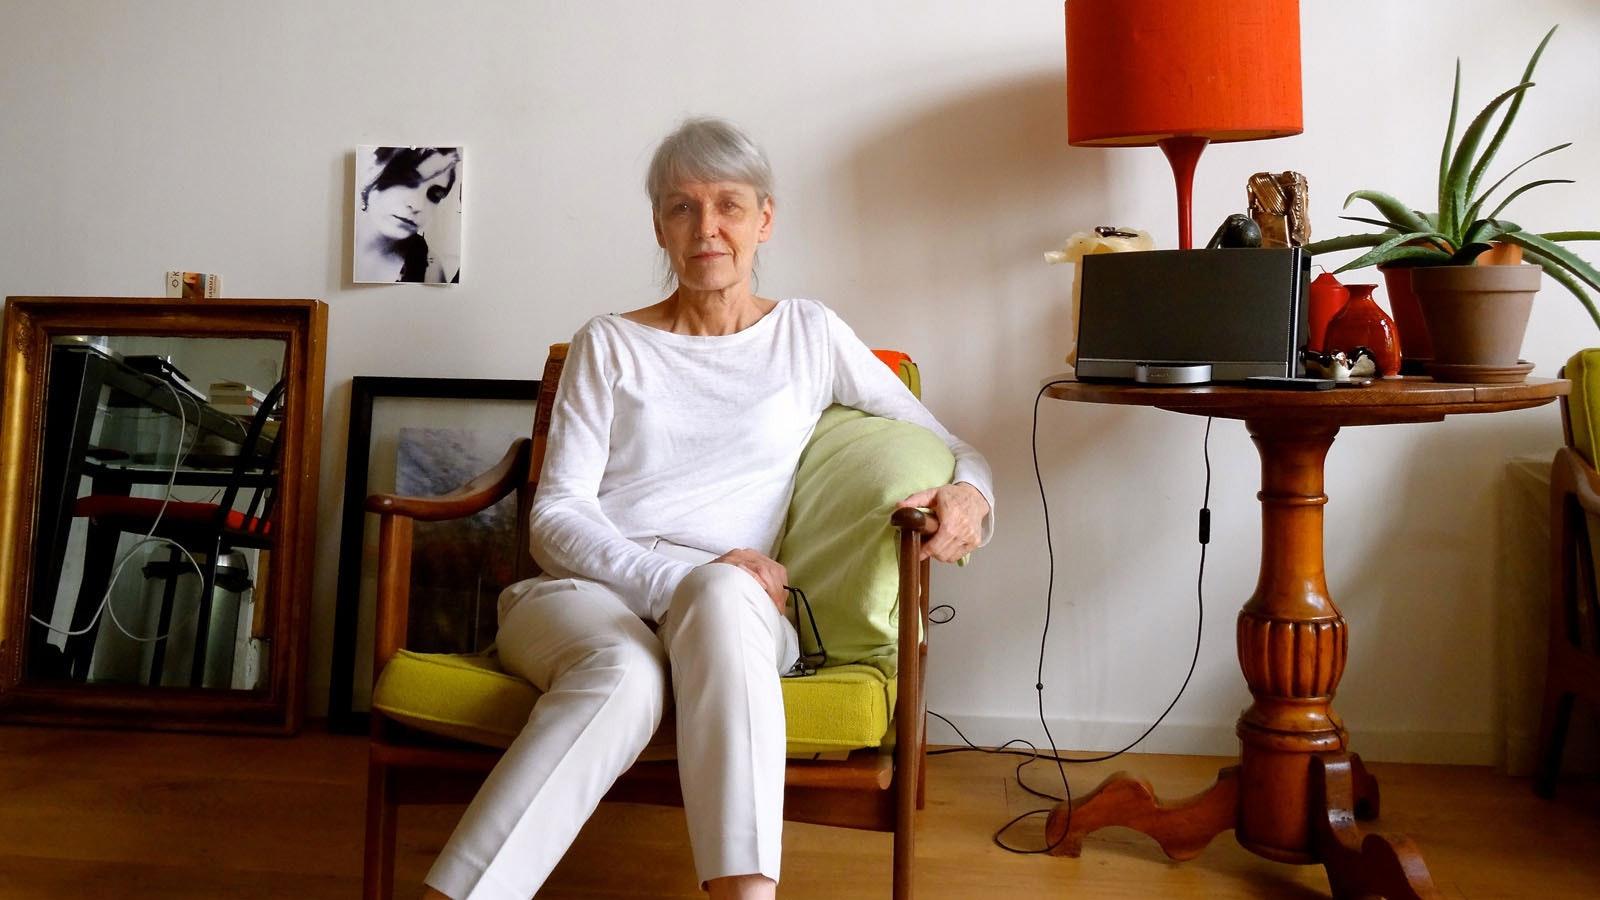 Agnès Godard photographed by Yonca Talu.